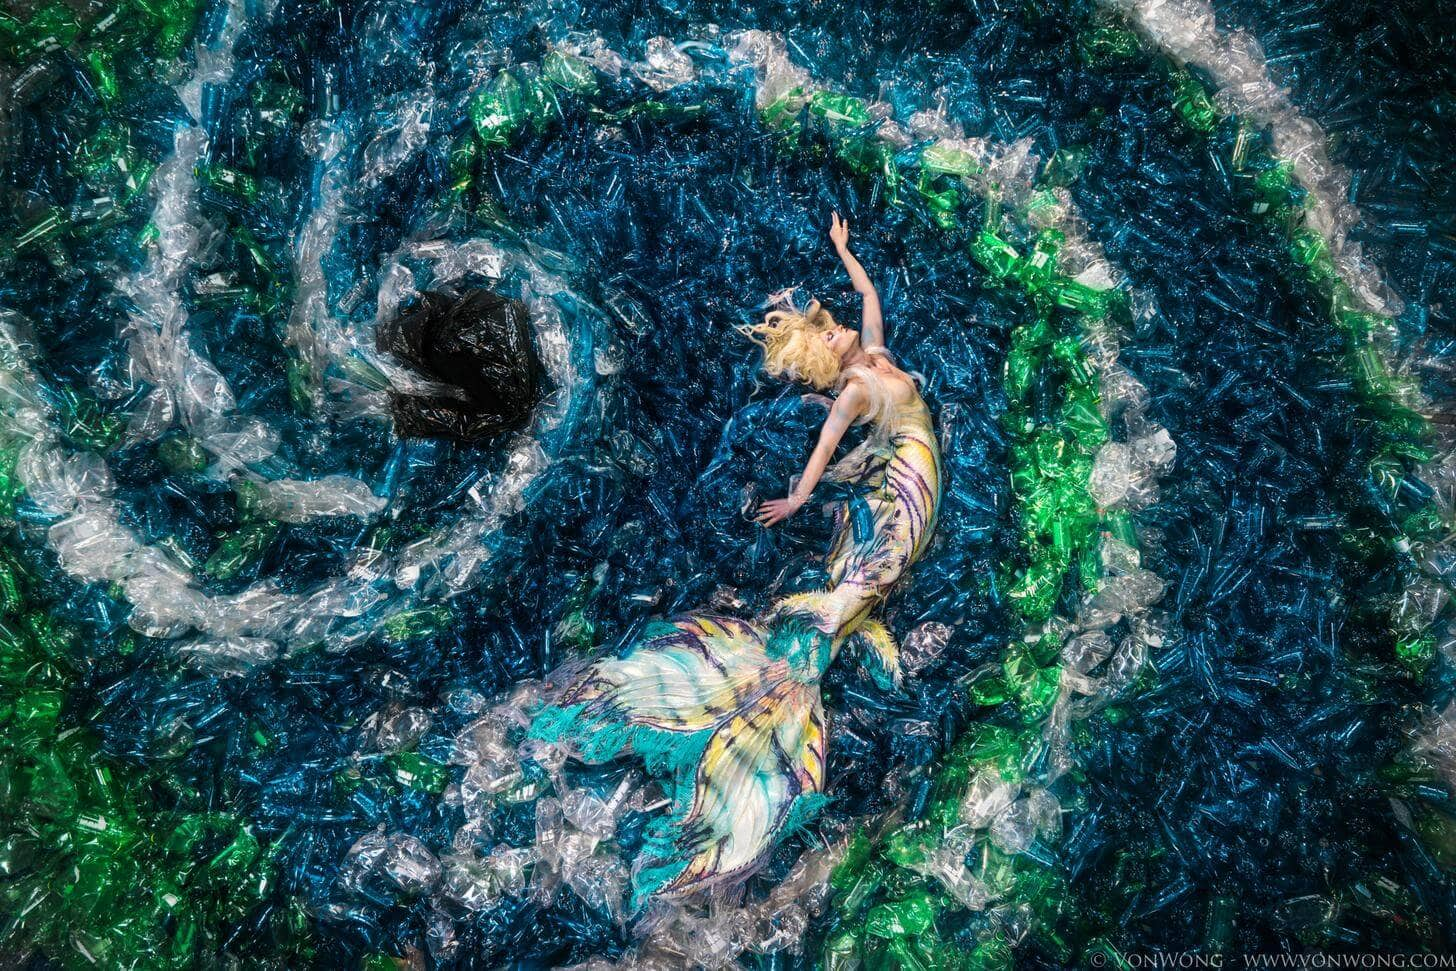 Benjamin Von Wong mermaid fy 8